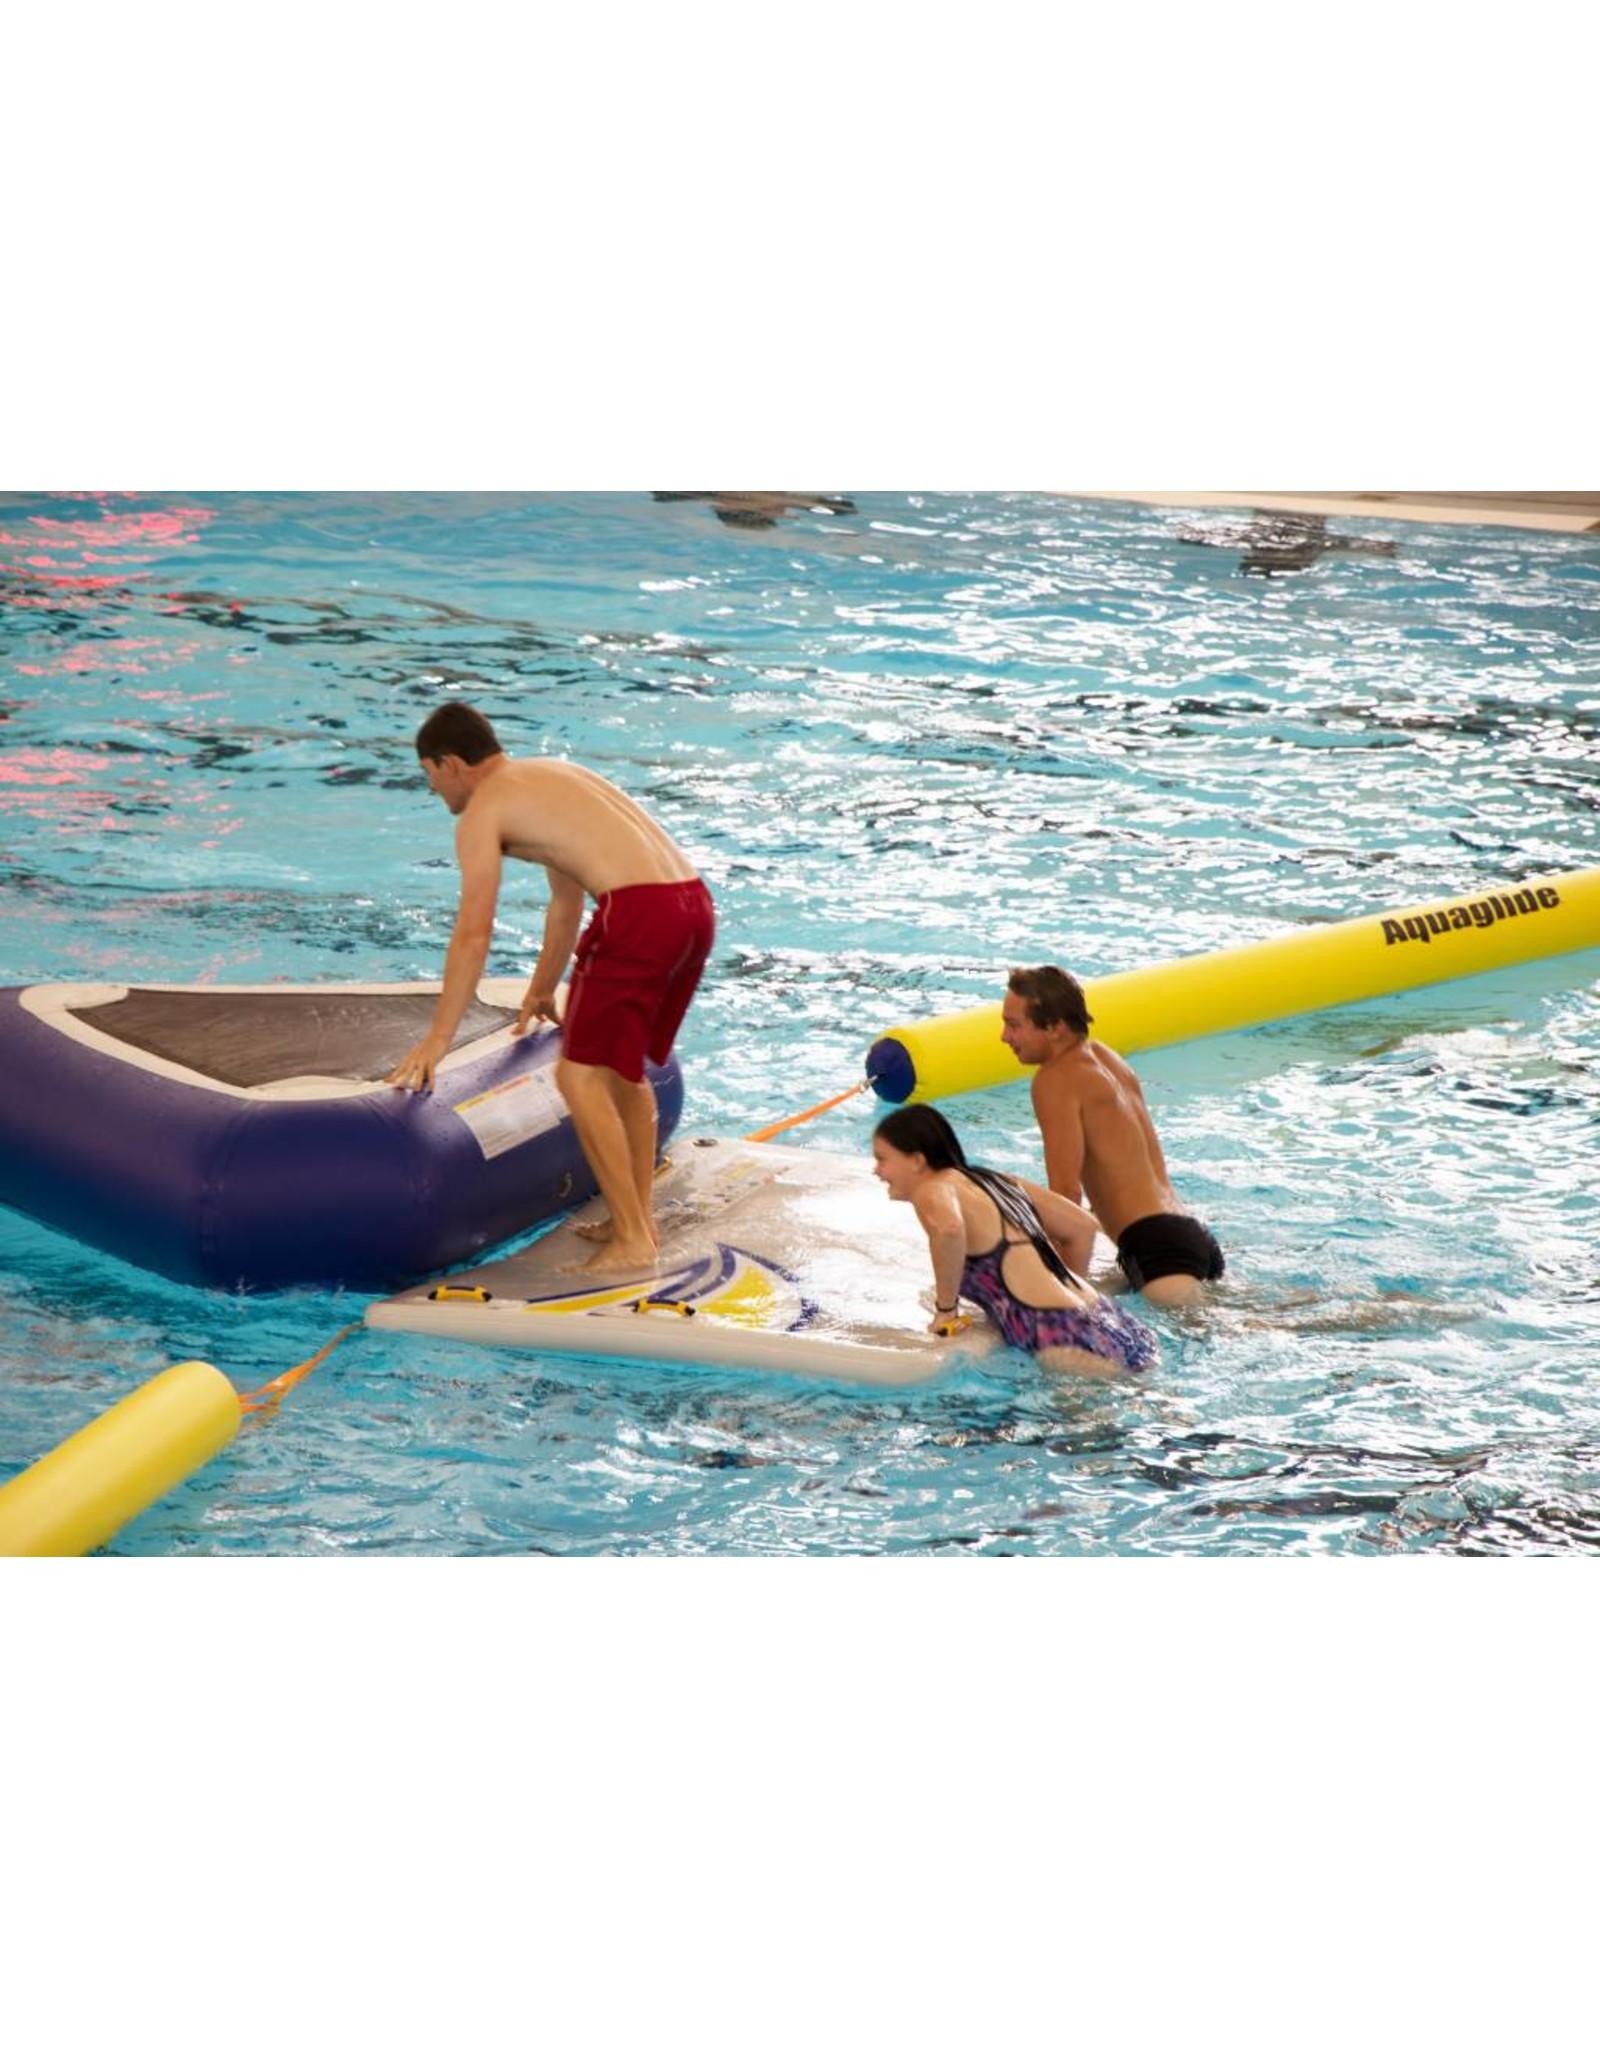 Aquaglide Swimstep XL (60 x 78 x 10cm)